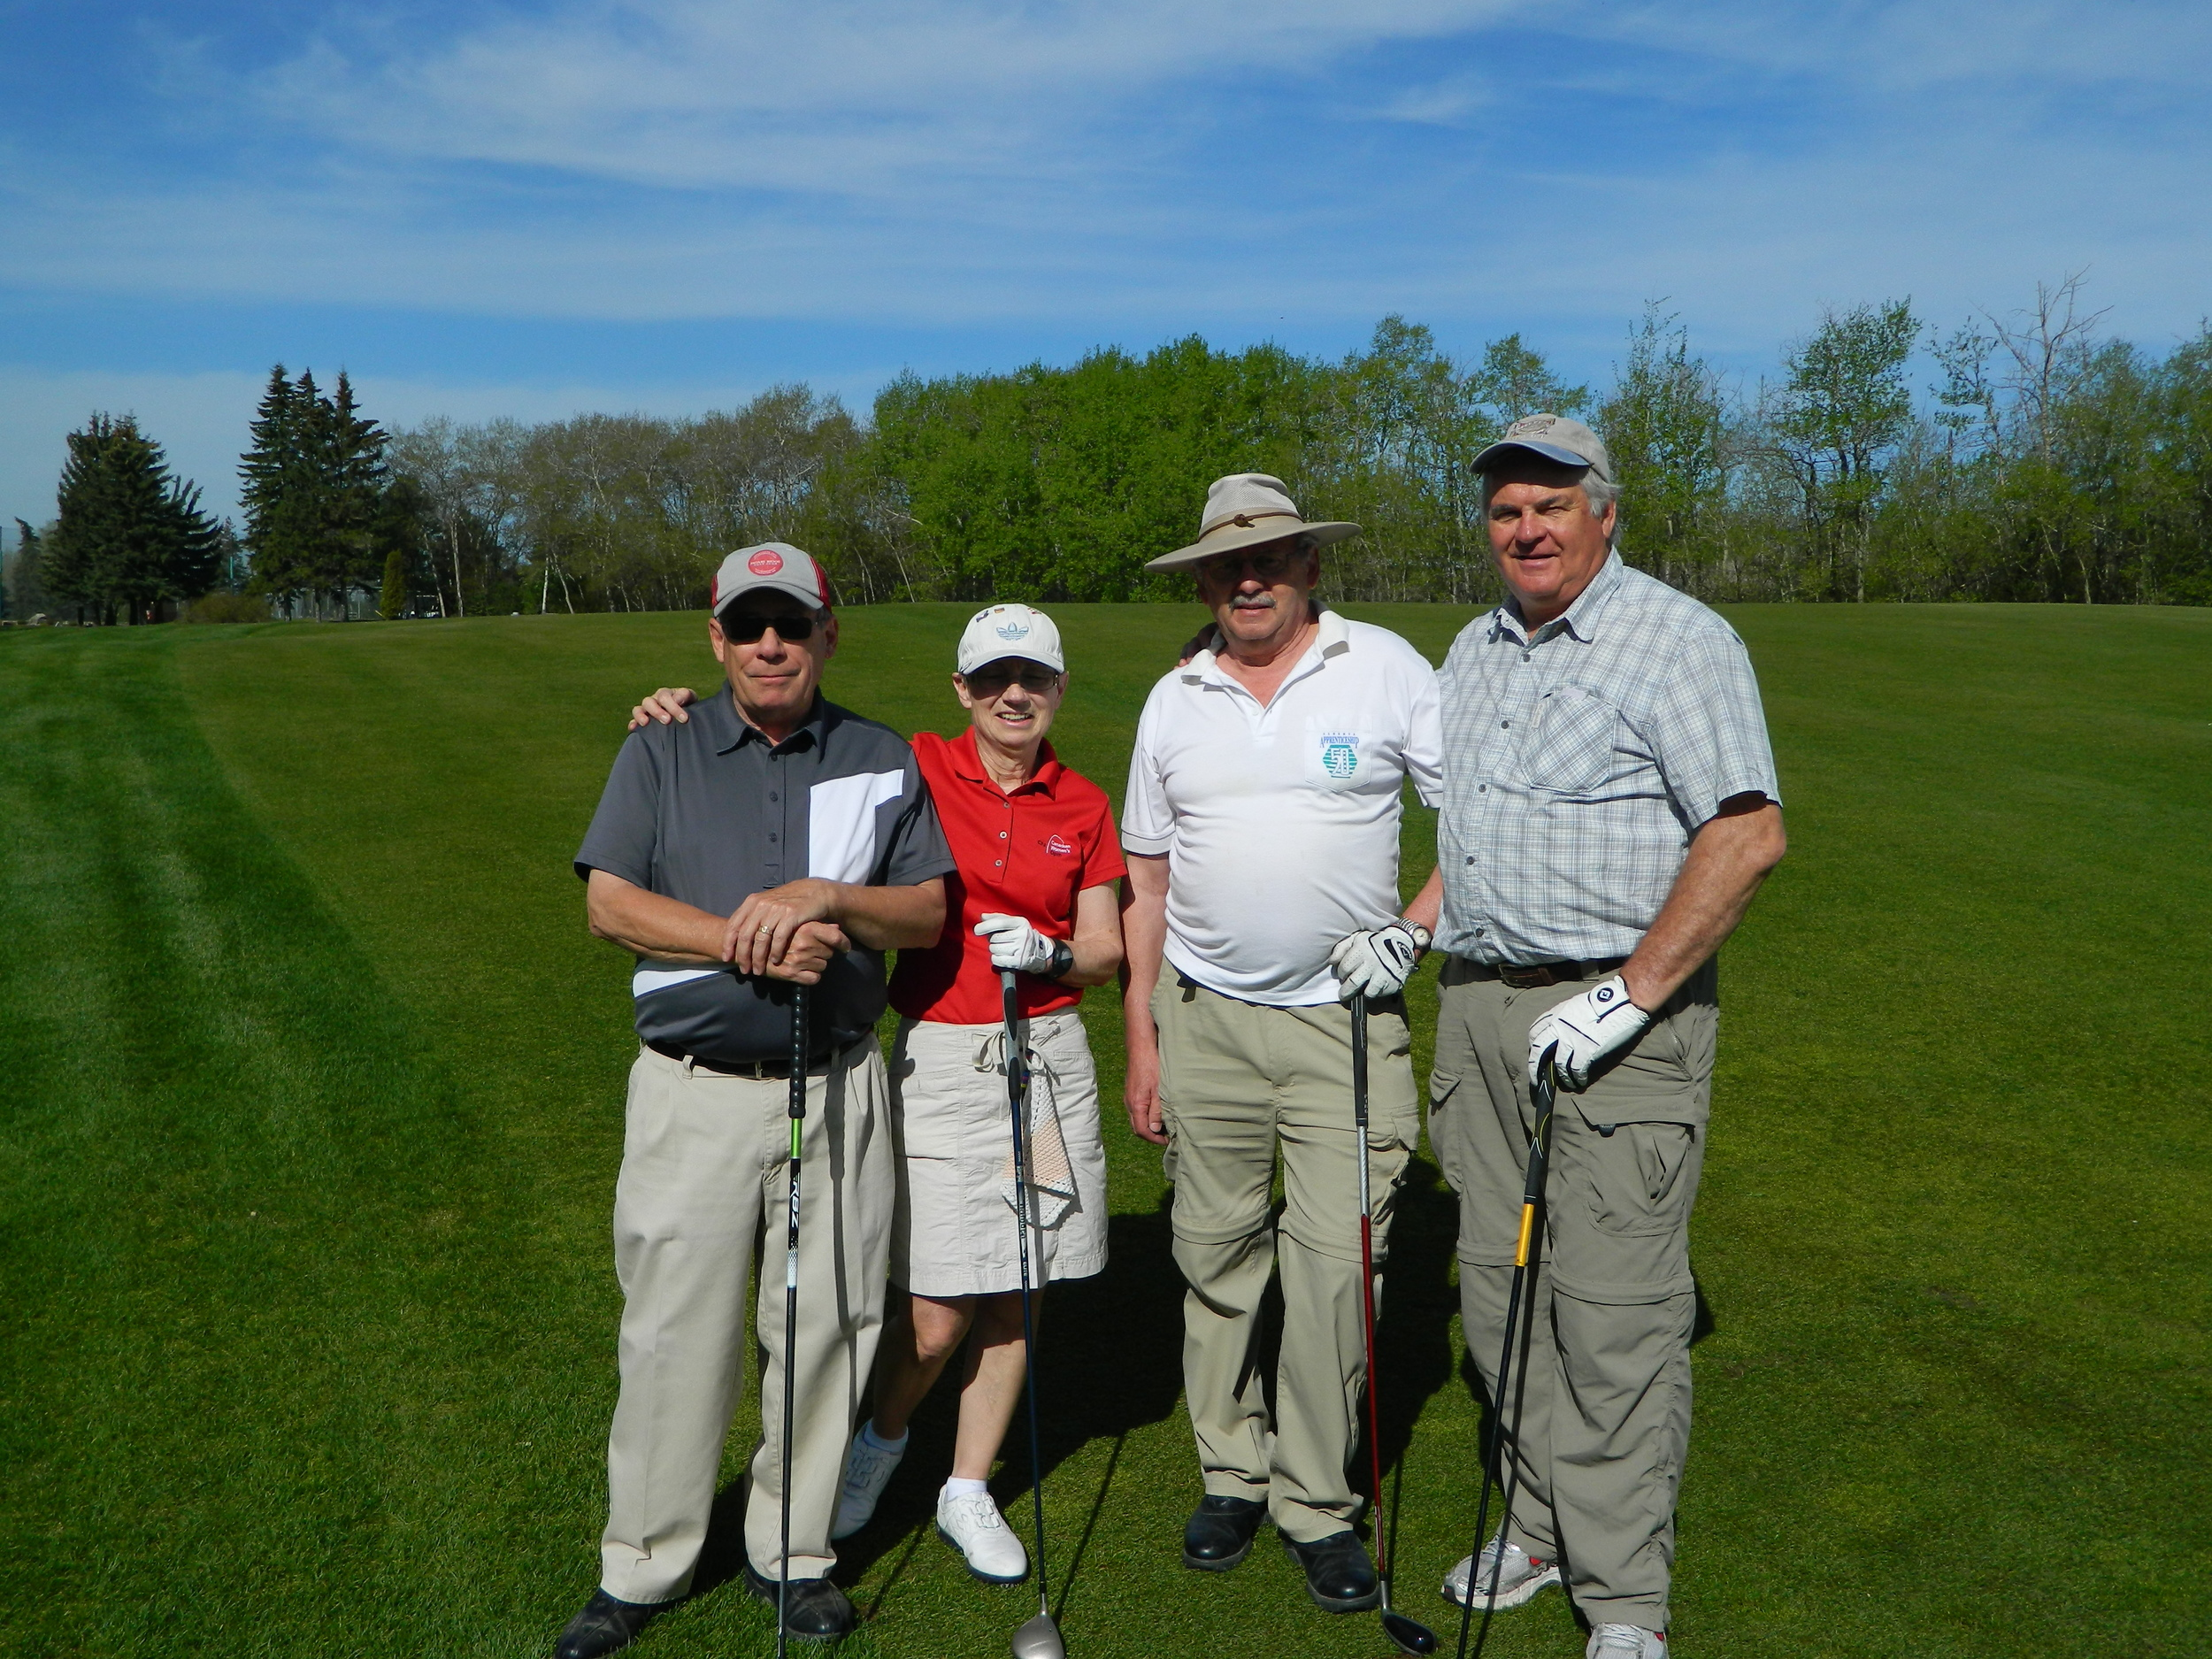 204 golfer pictures 006.jpg